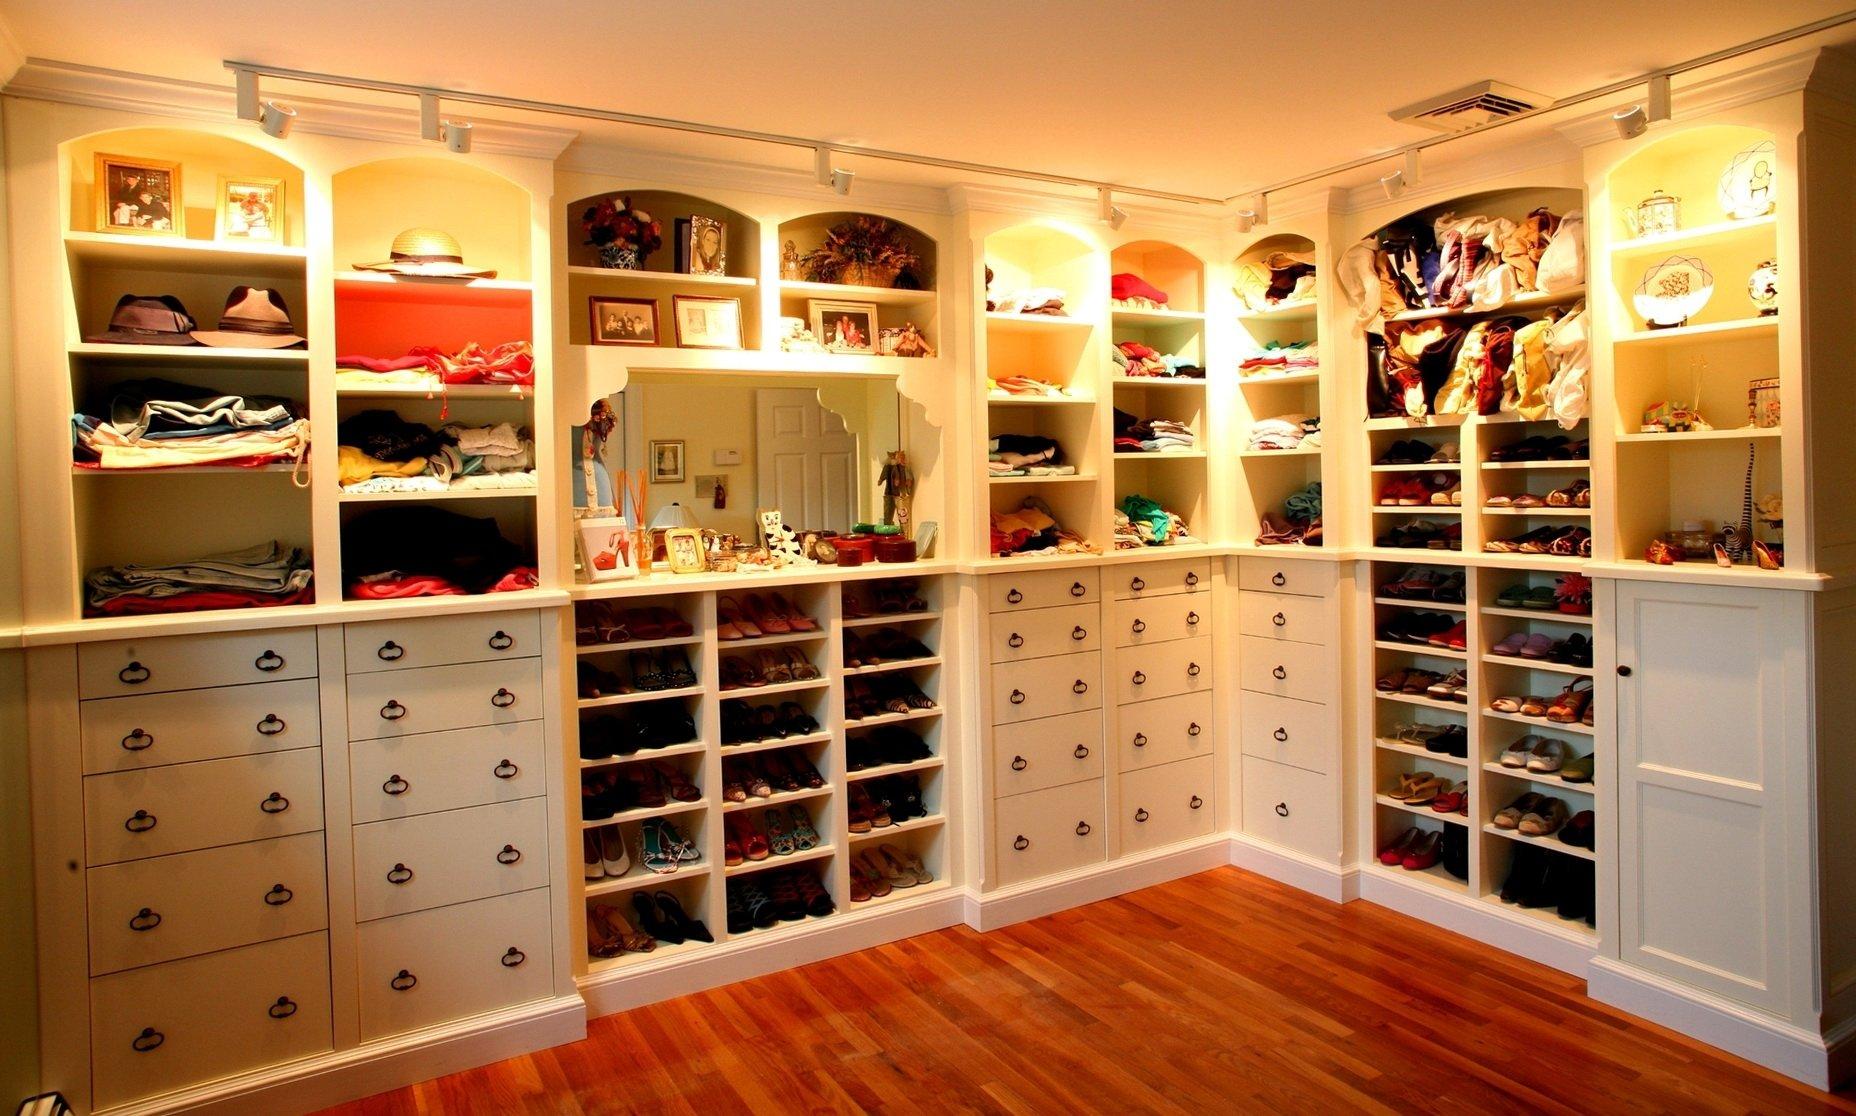 10 Fantastic Small Walk In Closet Design Ideas state closet design small walk as wells as small walk in closet diy